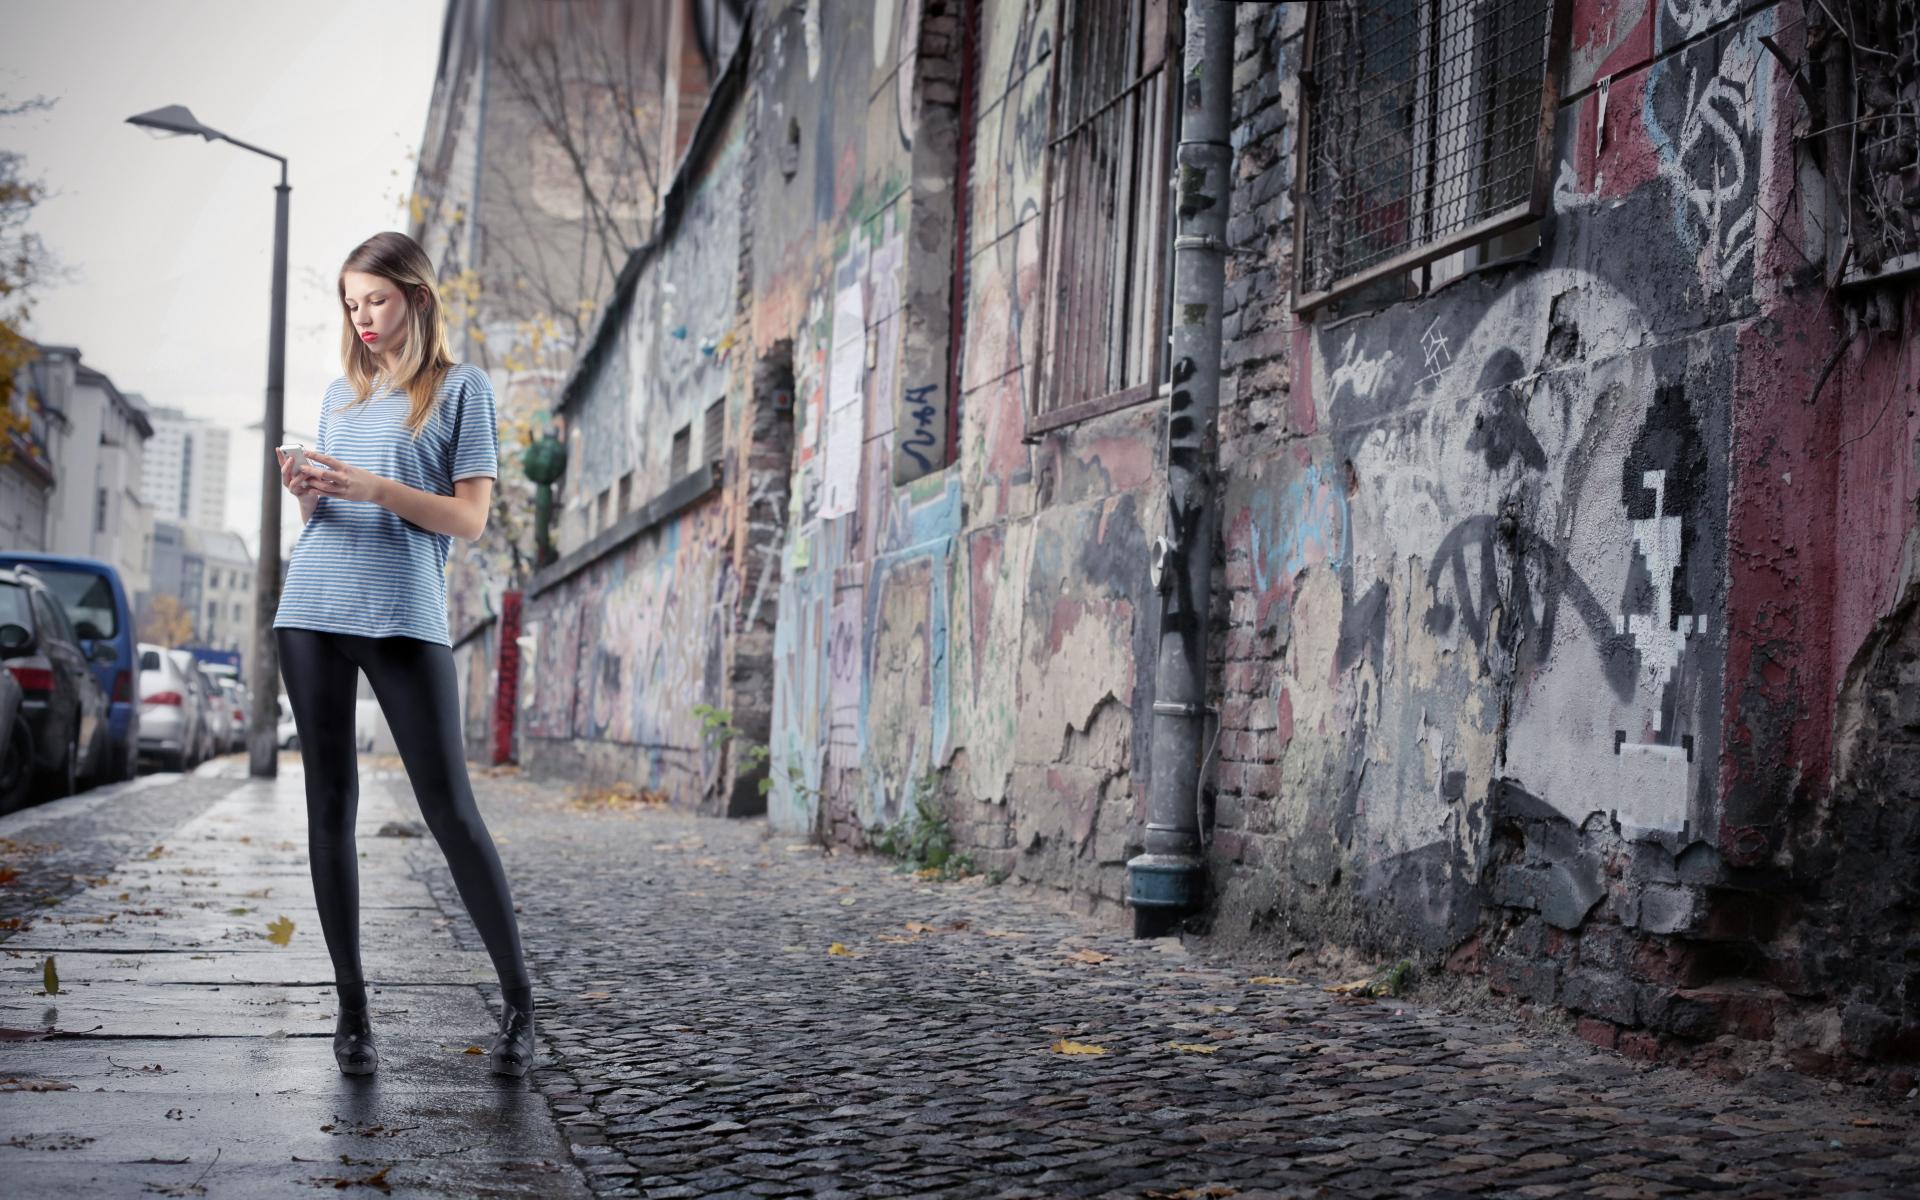 Картинки девушка, осень, город тротуар фото и обои на рабочий стол